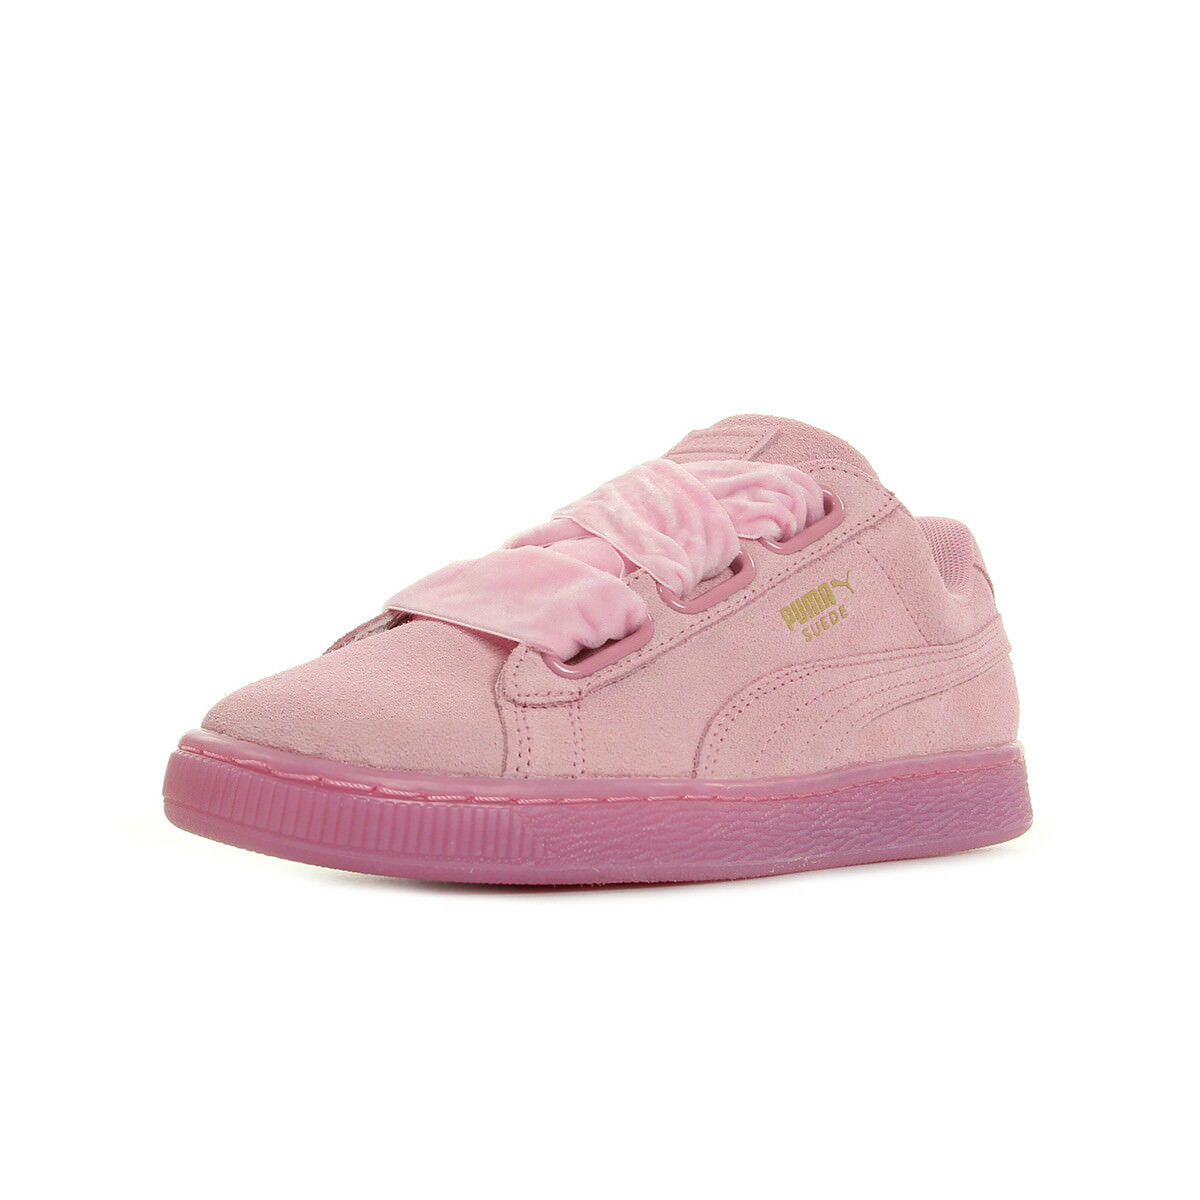 Schuhe Puma Damen Suede Heart Reset Wns rosa